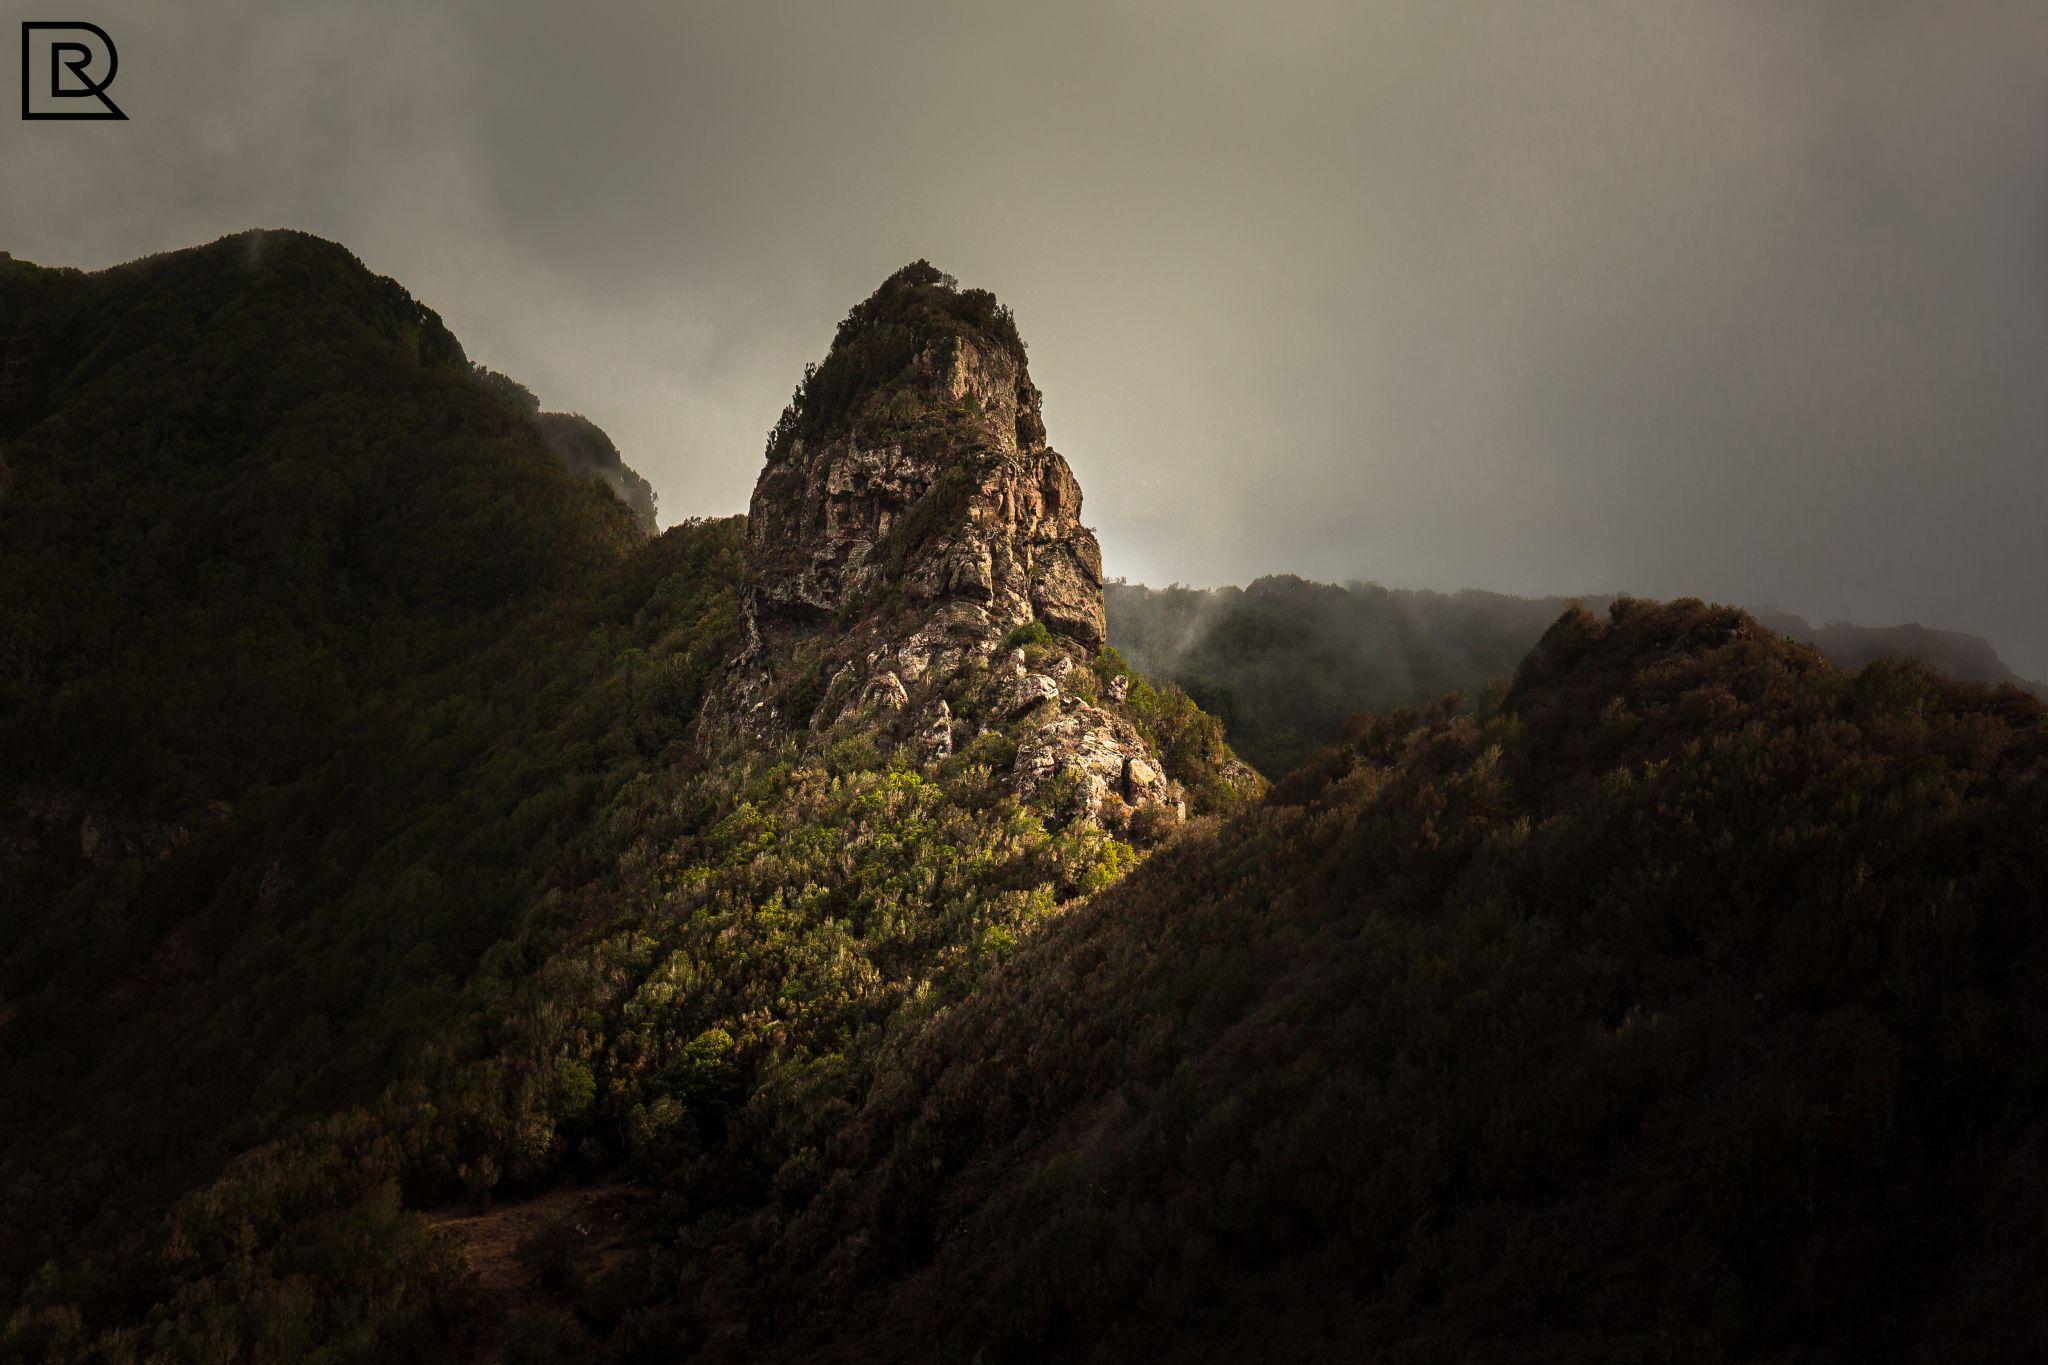 rock in Azanos, Spain